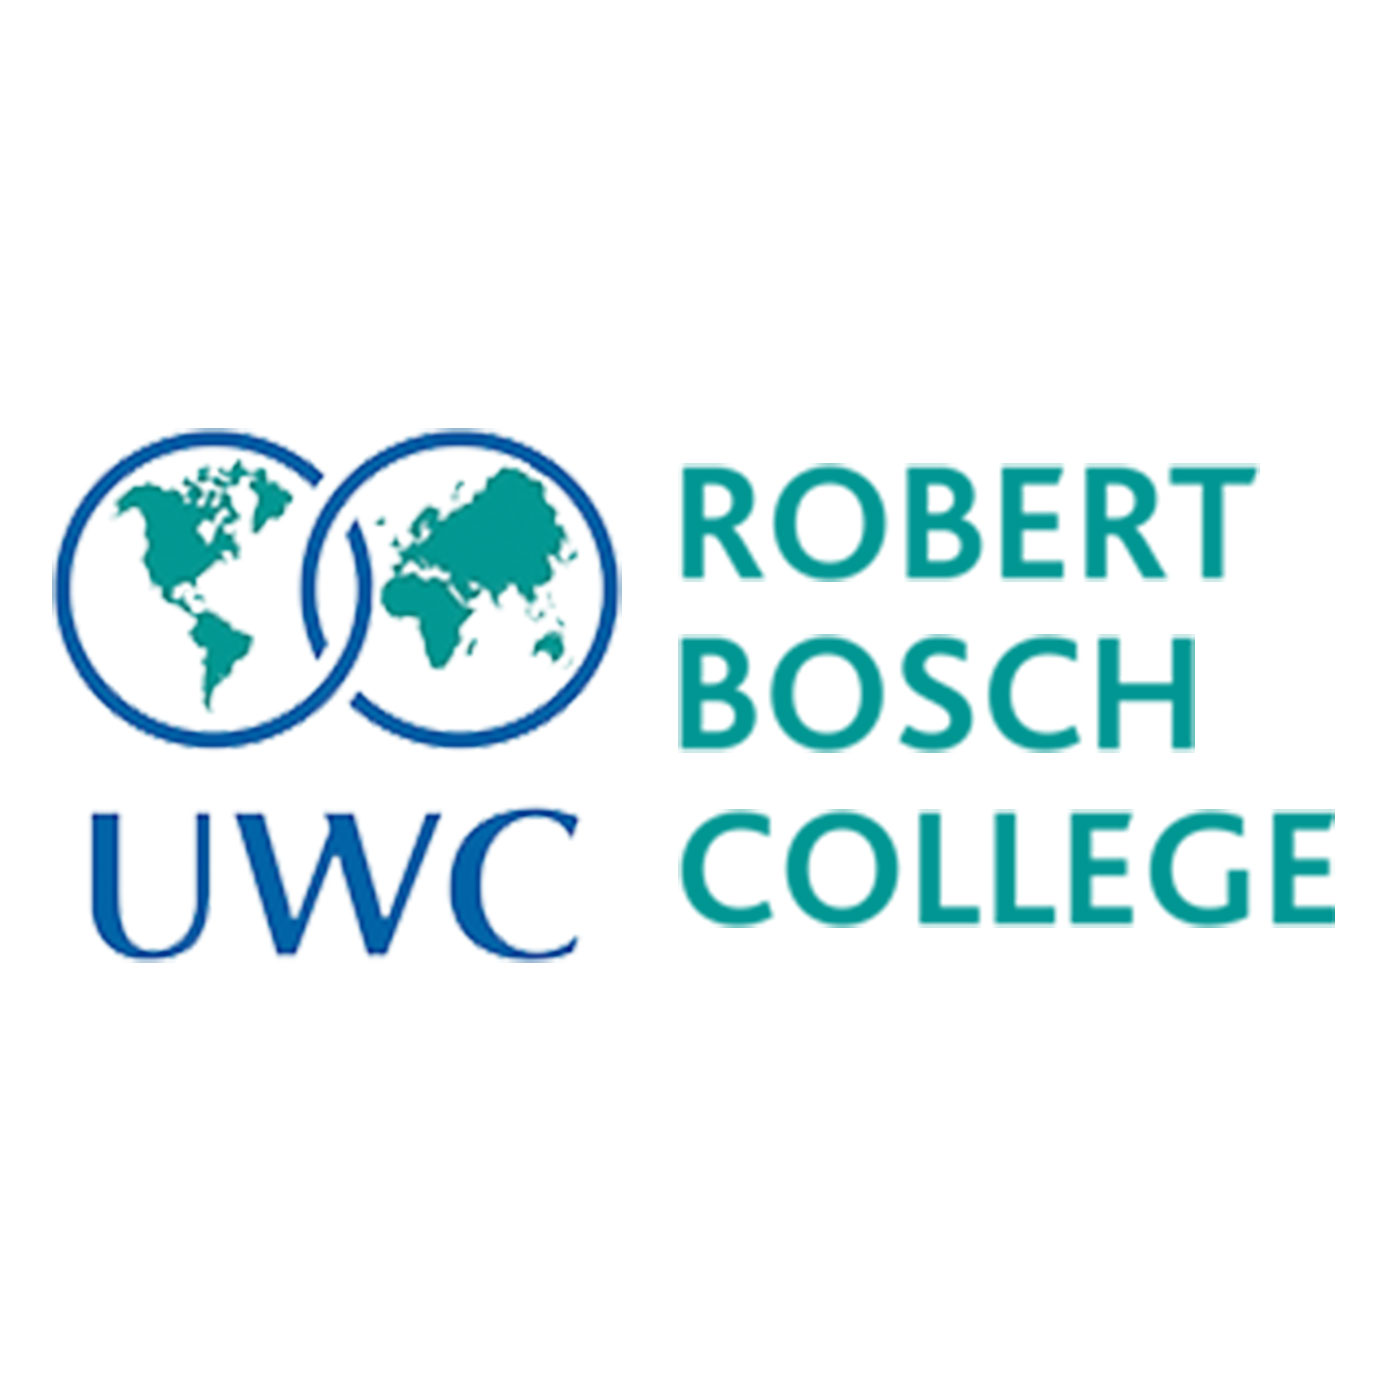 UWC Robert Bosch College Podcast